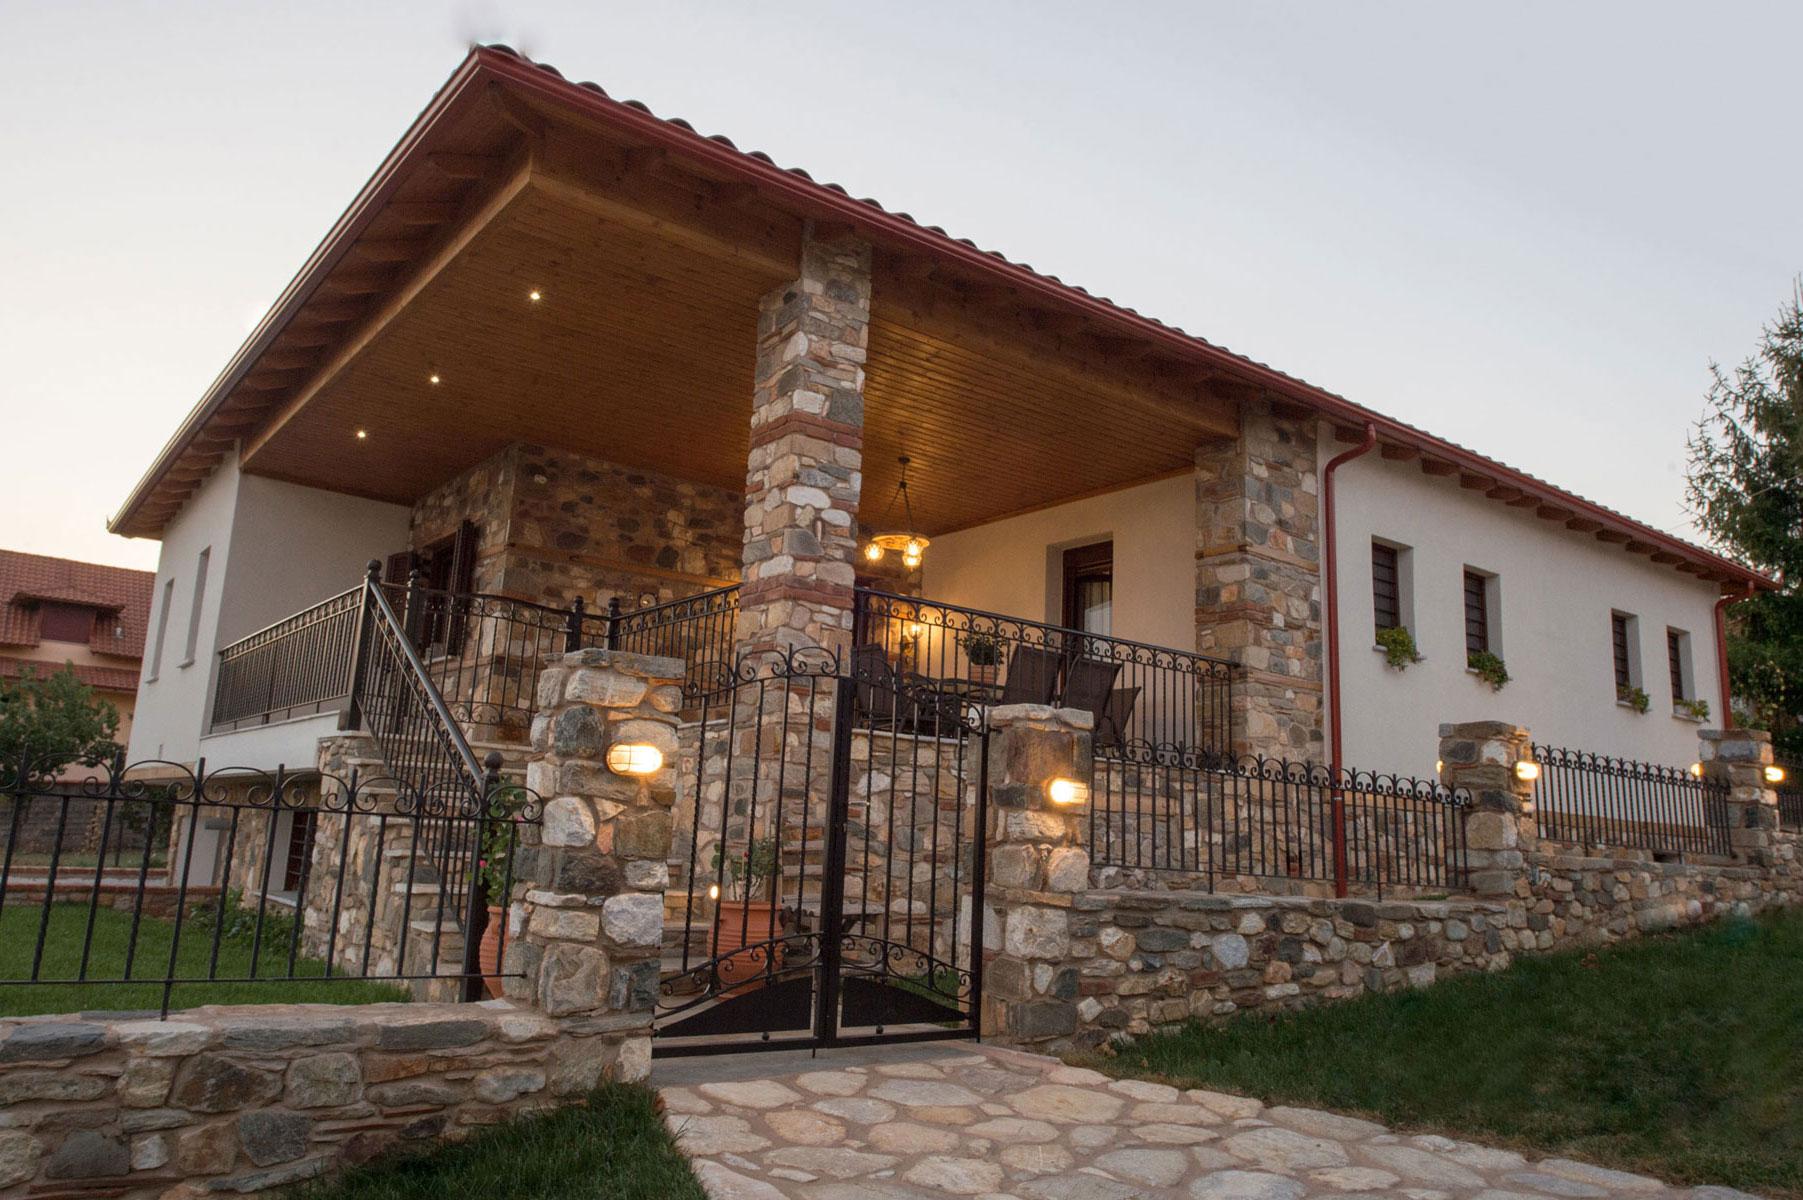 KATOIKIA - ΣΟΧΟΣ - ΘΕΣΣΑΛΟΝΙΚΗ HOME - SOHOS - THESSALONIKI